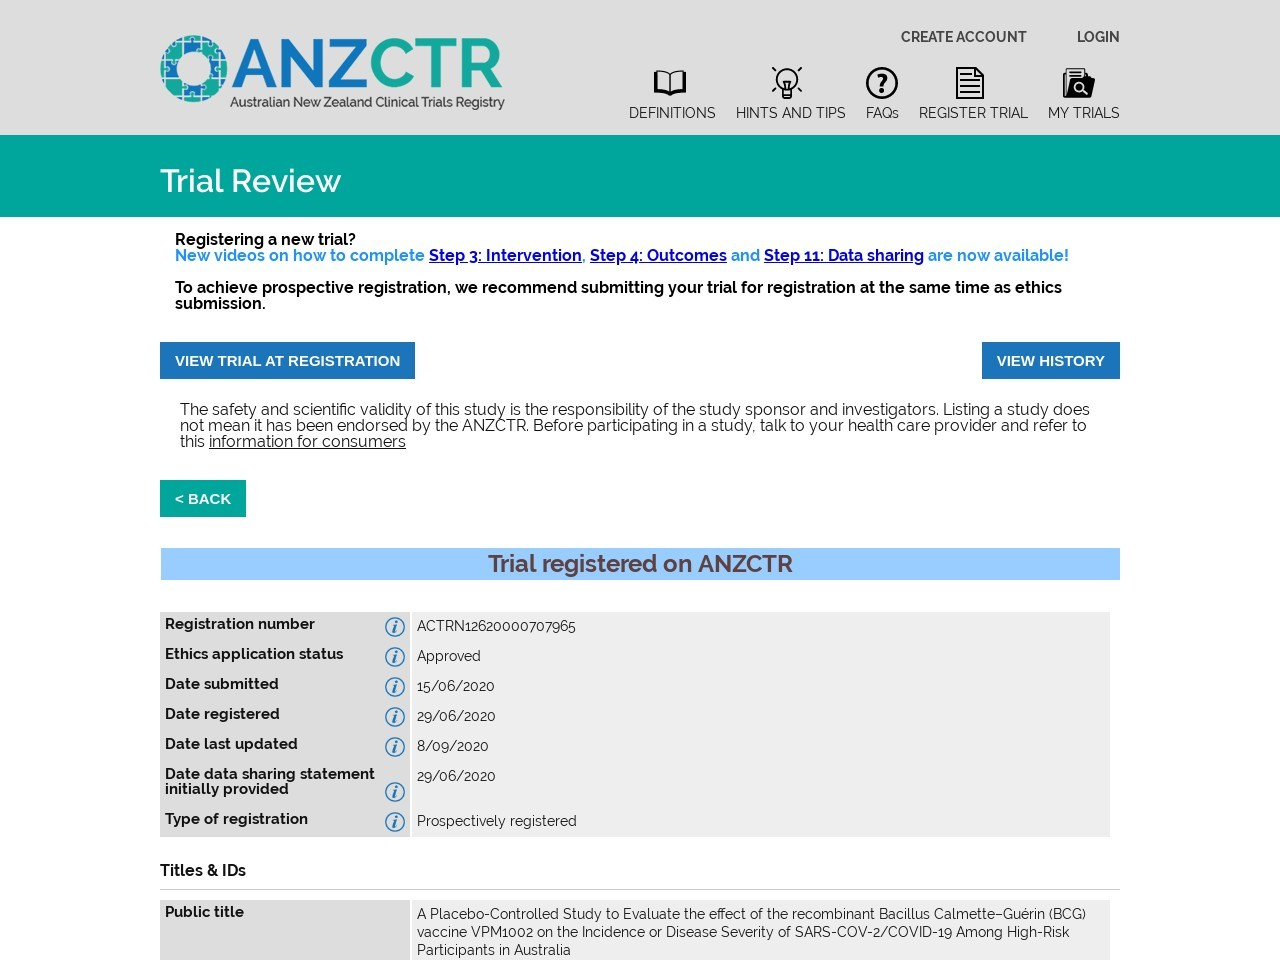 ANZCTR - Registration